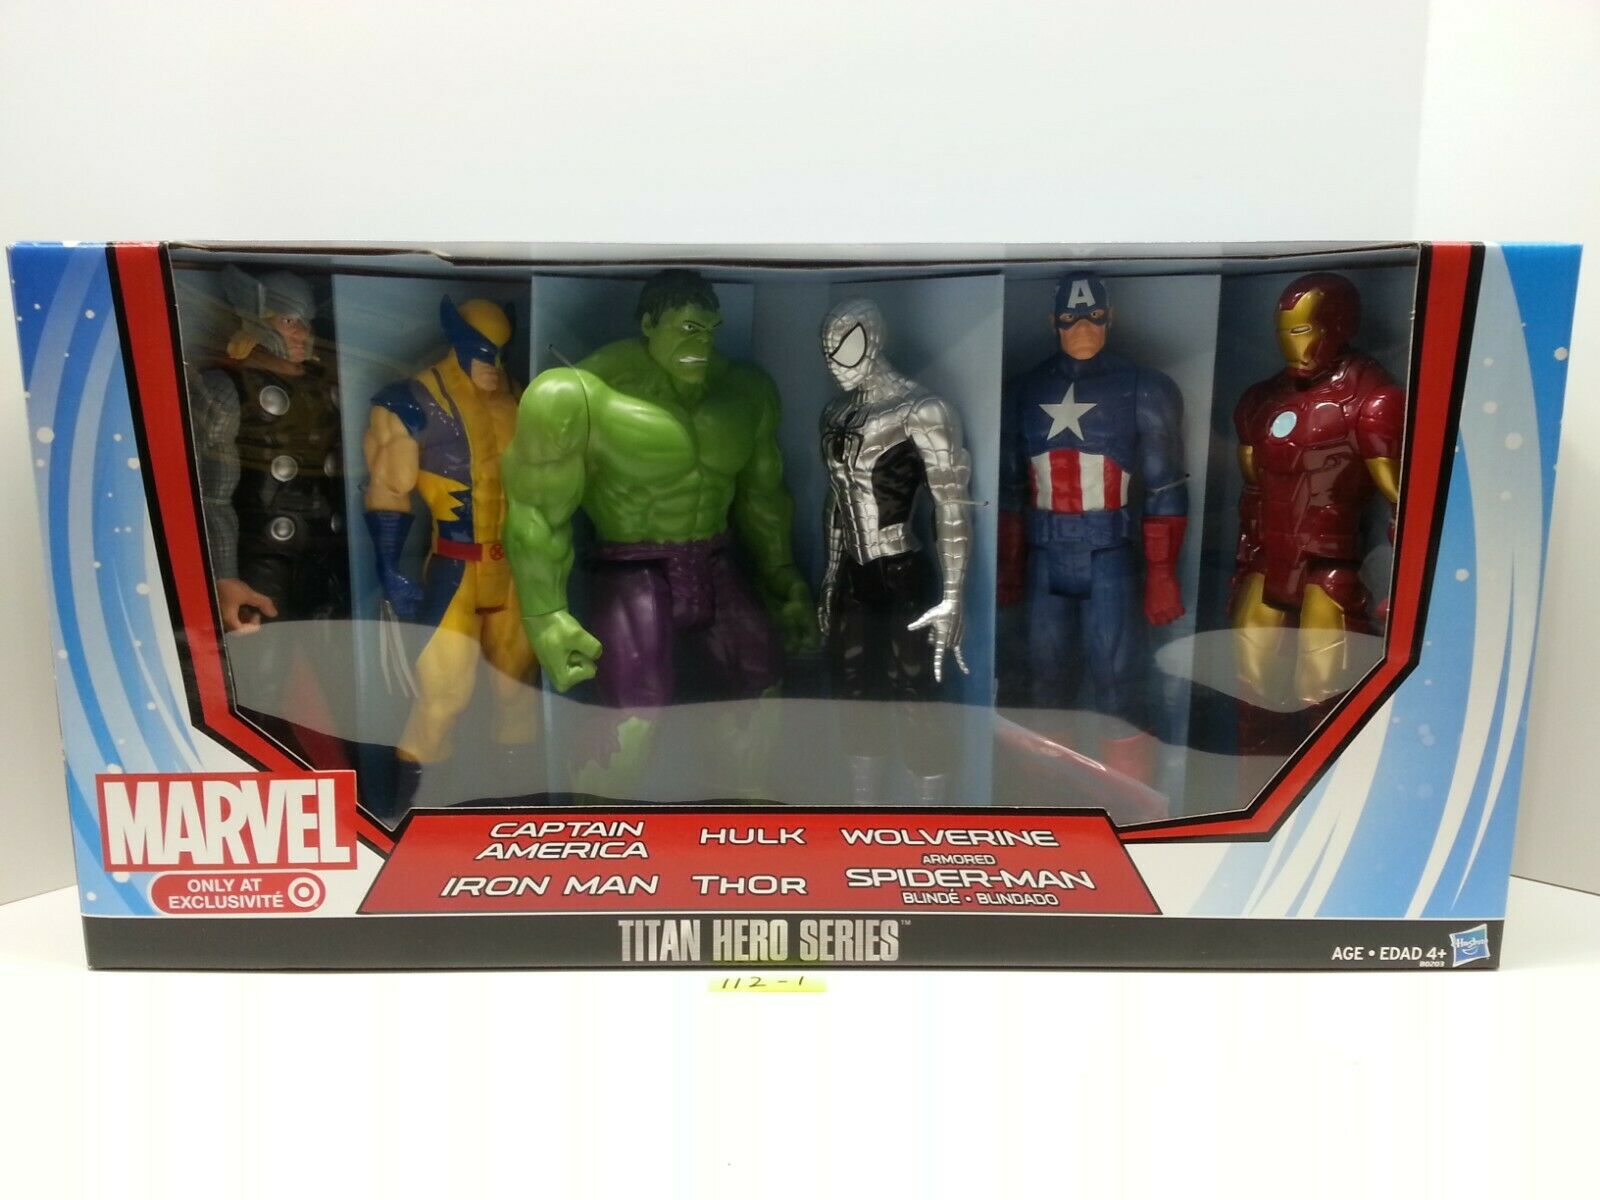 Titan Hero Series 12  Marvel-Exclusivo-Totalmente Nuevo-TARGET blindado Spiderman